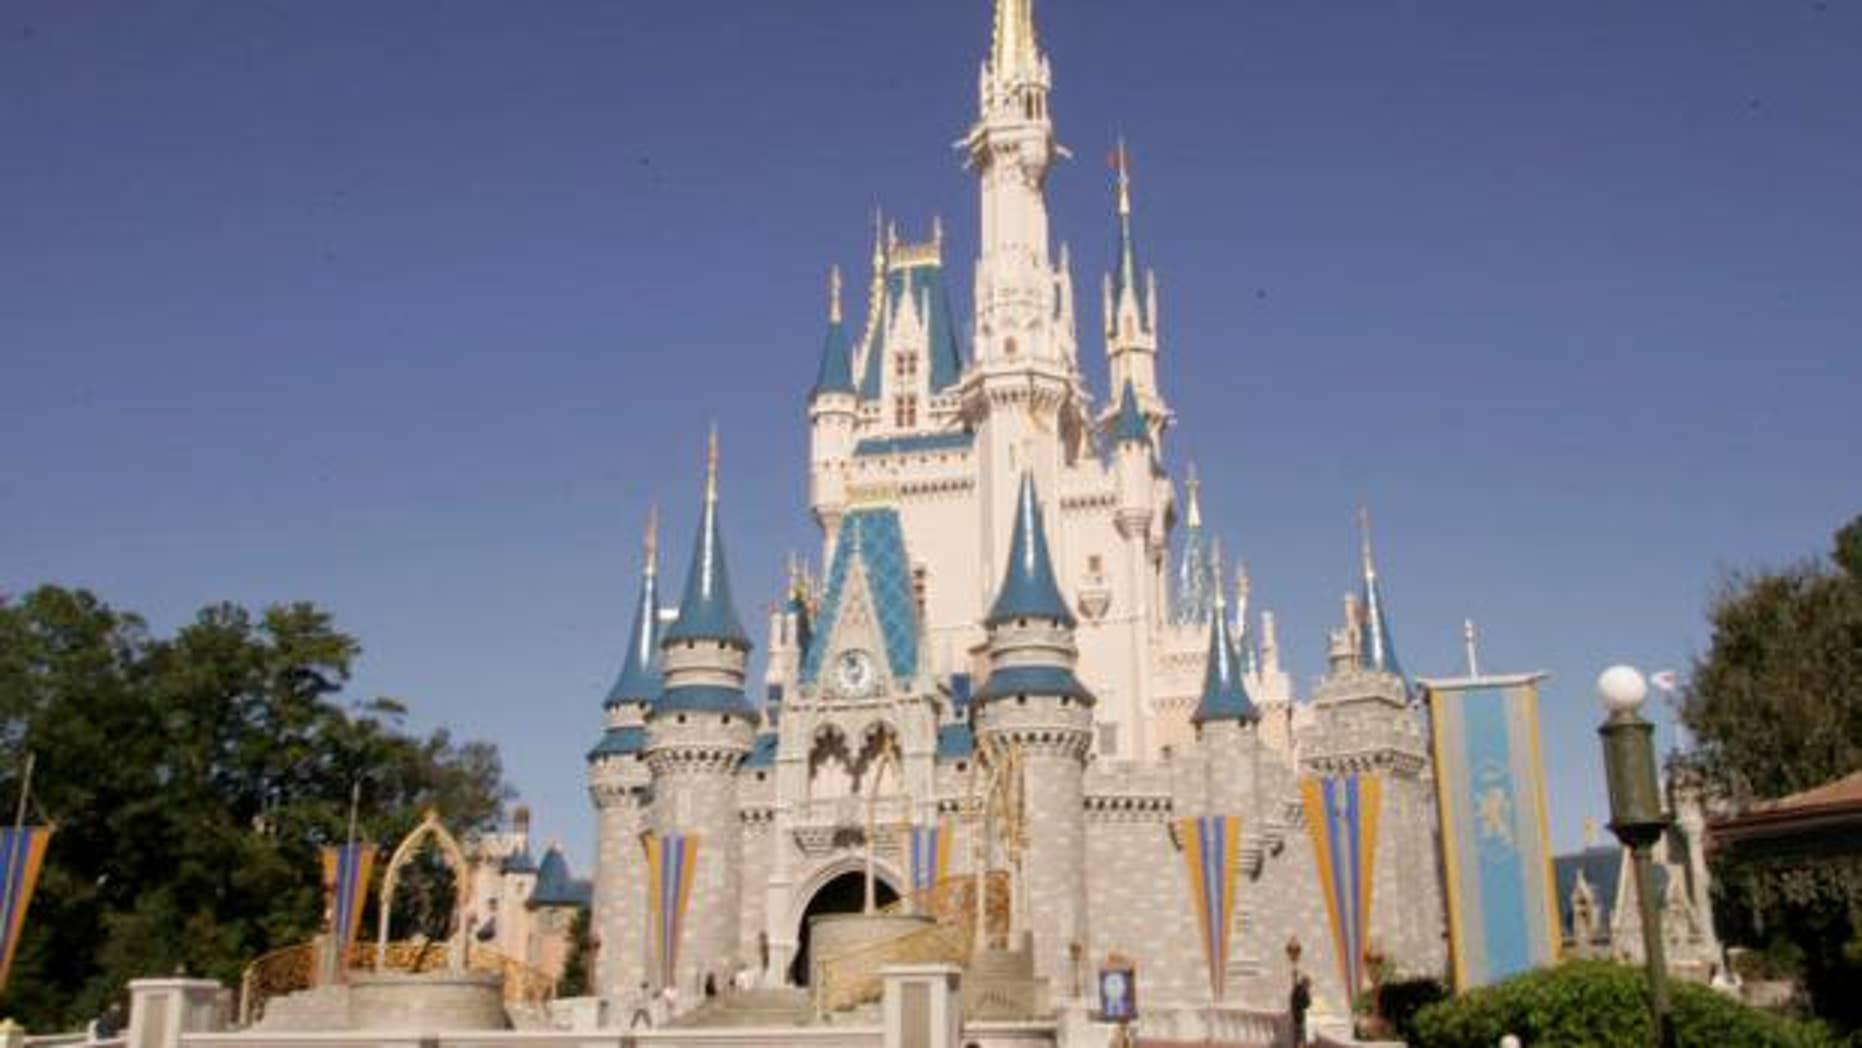 Disney's Magic Kingdom is the most popular theme park in the U.S.